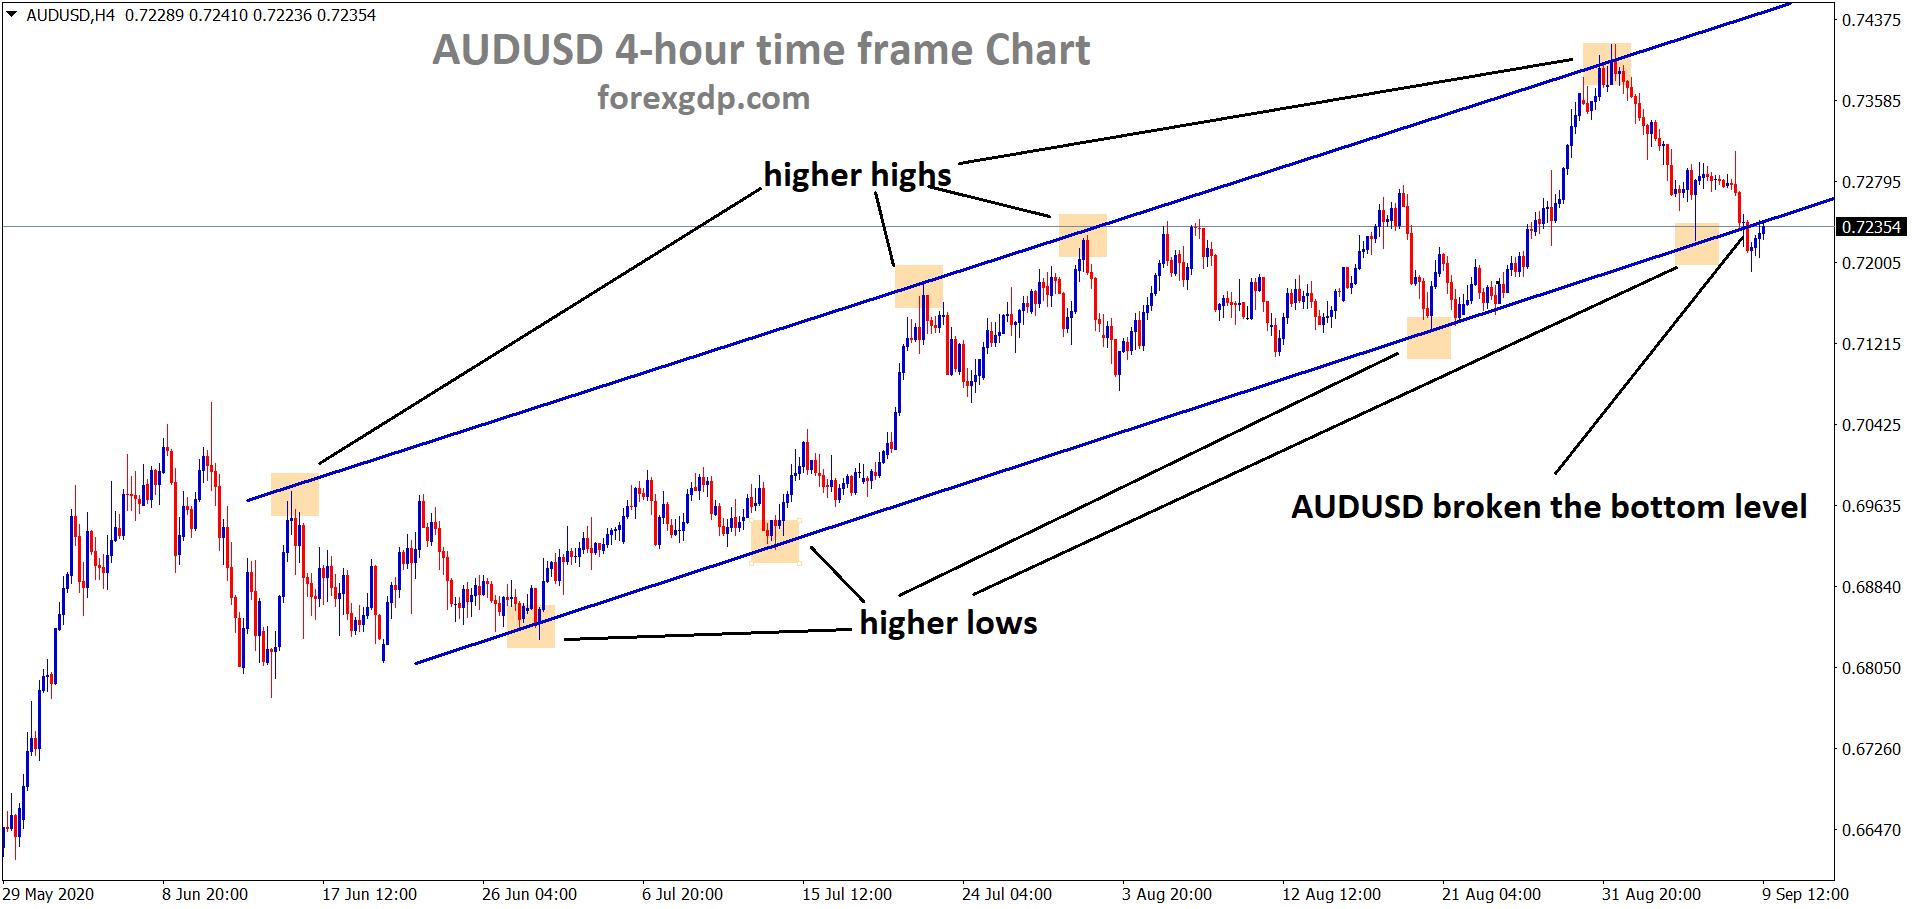 audusd broken the bottom level of Uptrend line